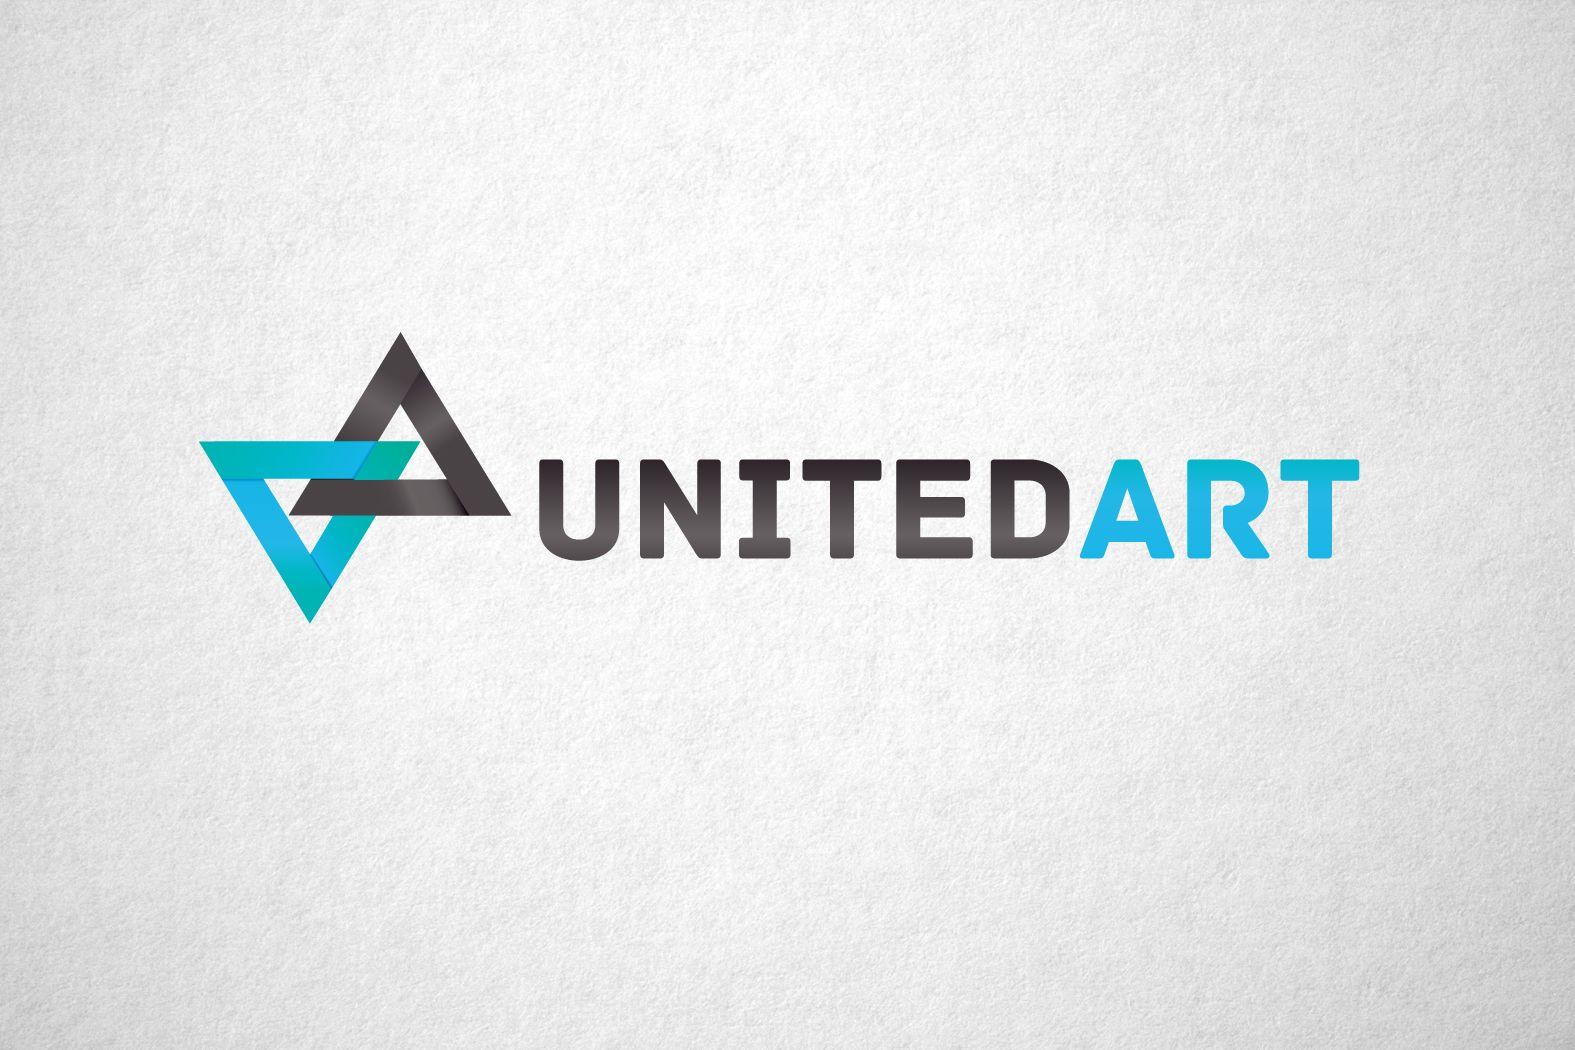 Логотип для компании United Art - дизайнер funkielevis